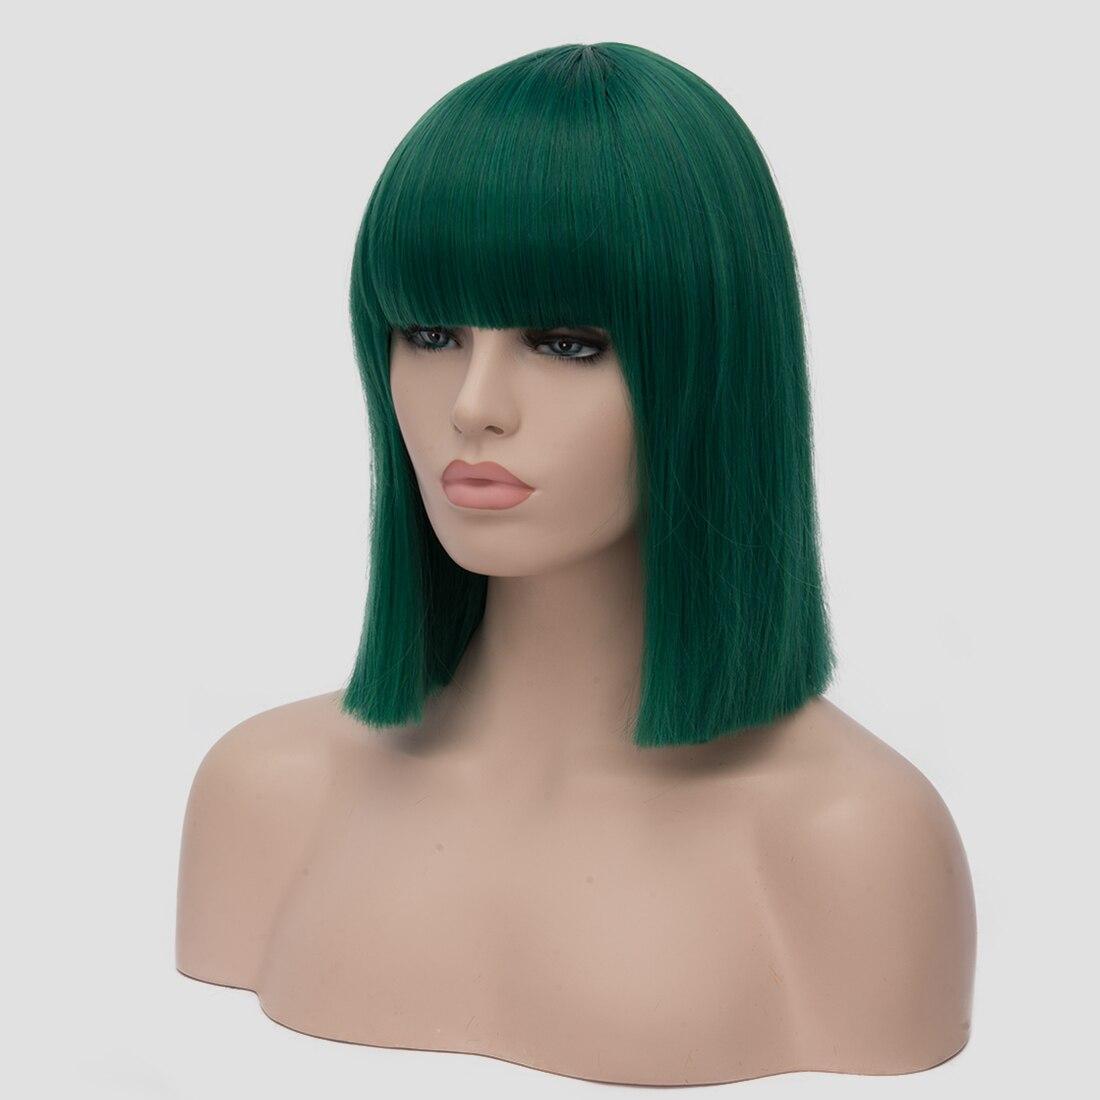 Semler perucas de cabelo curto de fibra